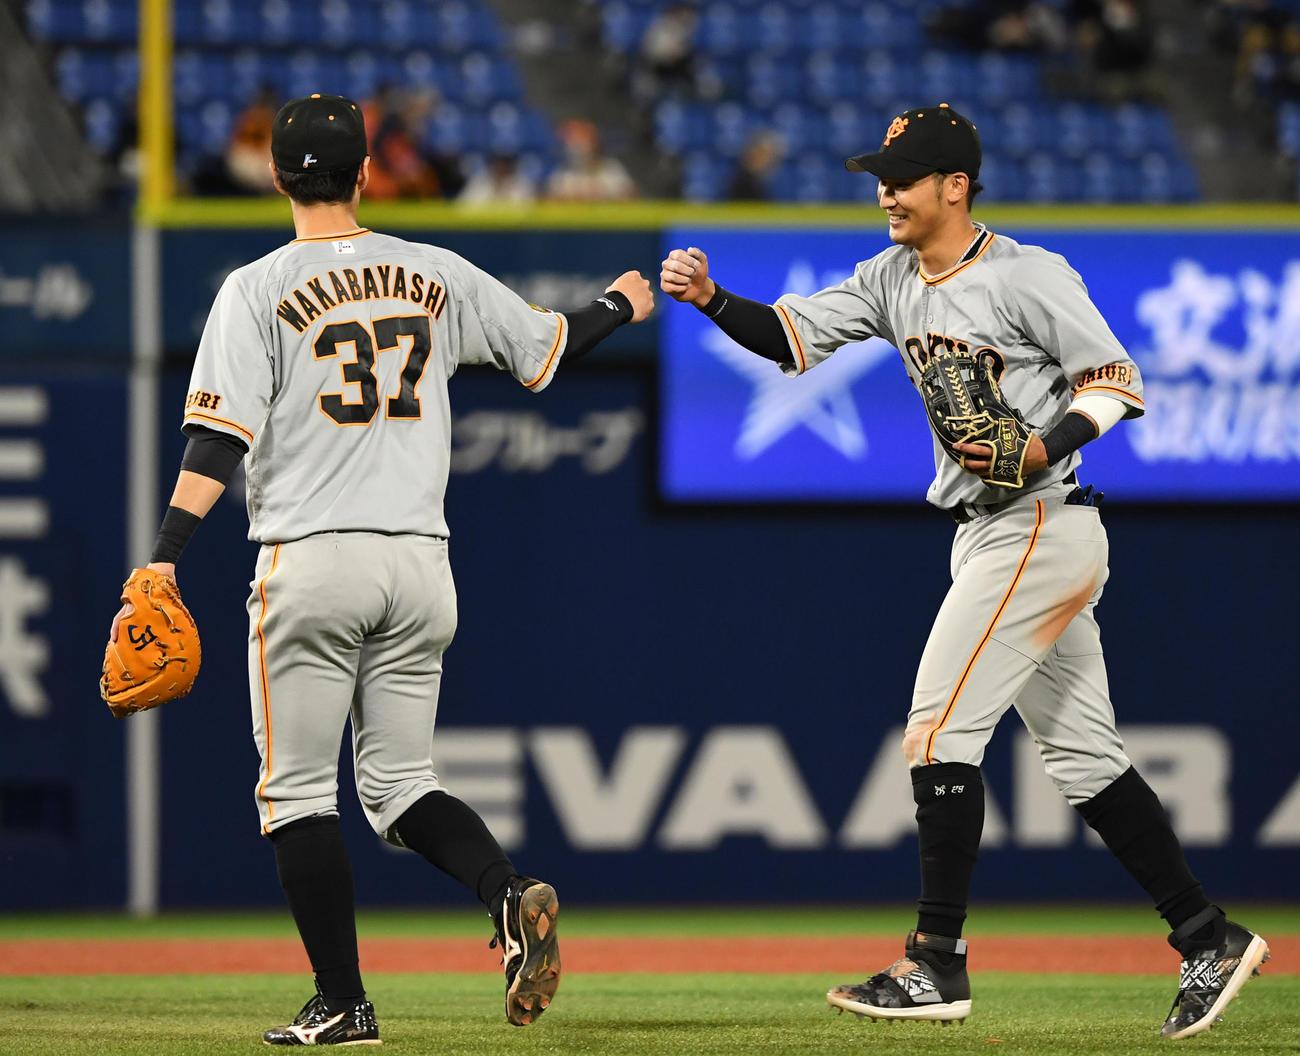 DeNA対巨人 DeNAに勝利しタッチを交わす巨人若林(左)と吉川(撮影・横山健太)